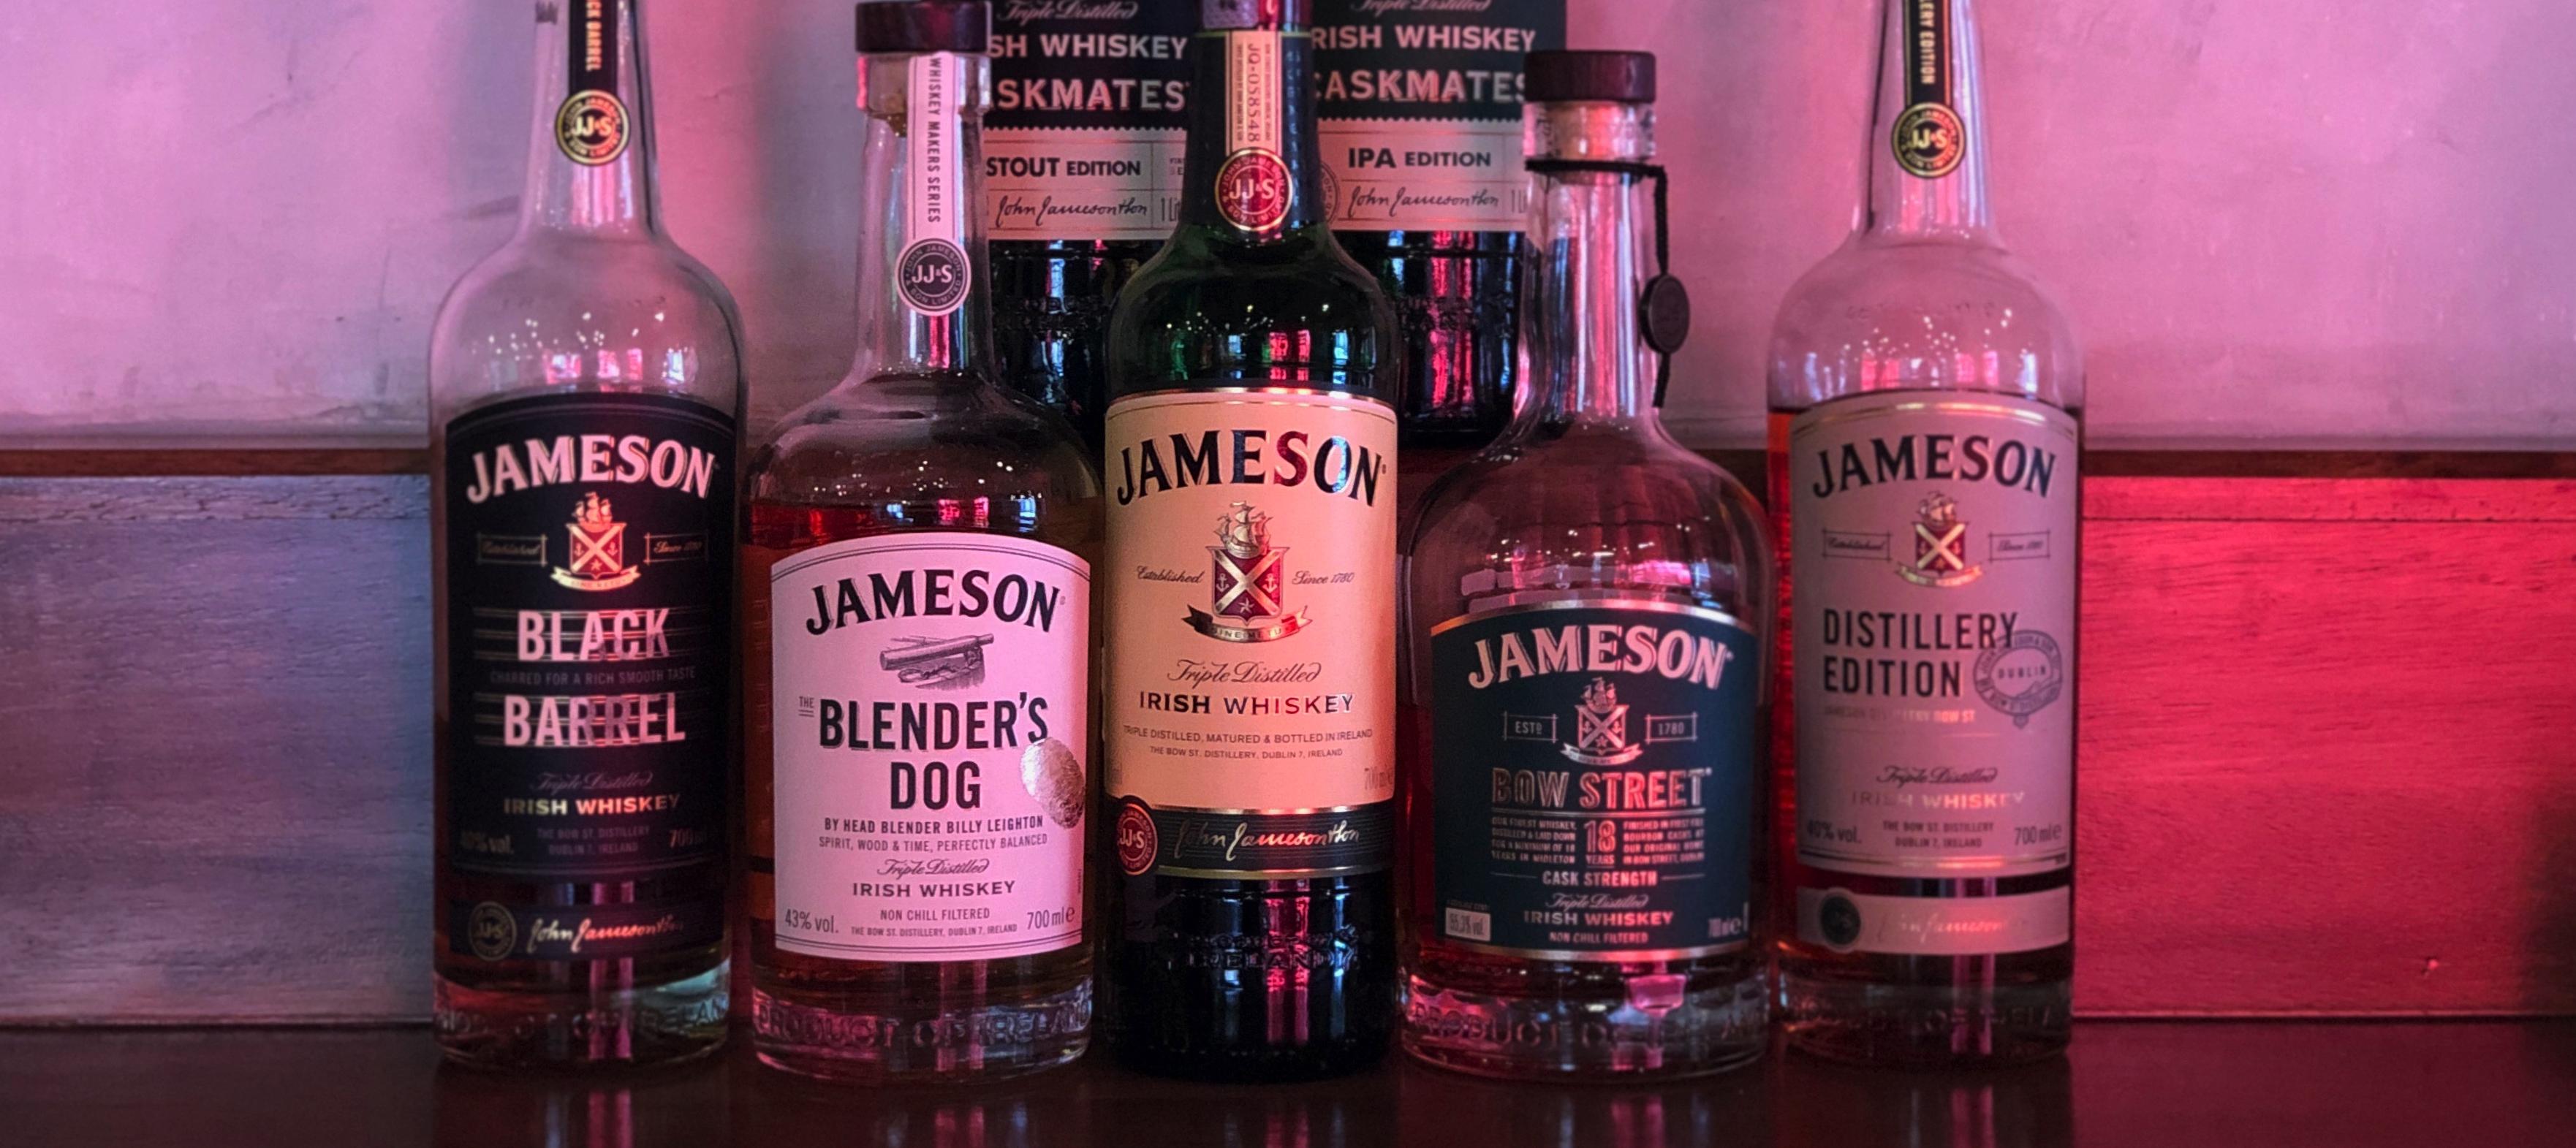 Jameson Irish Whiskey, The Green Gold Of Ireland photo